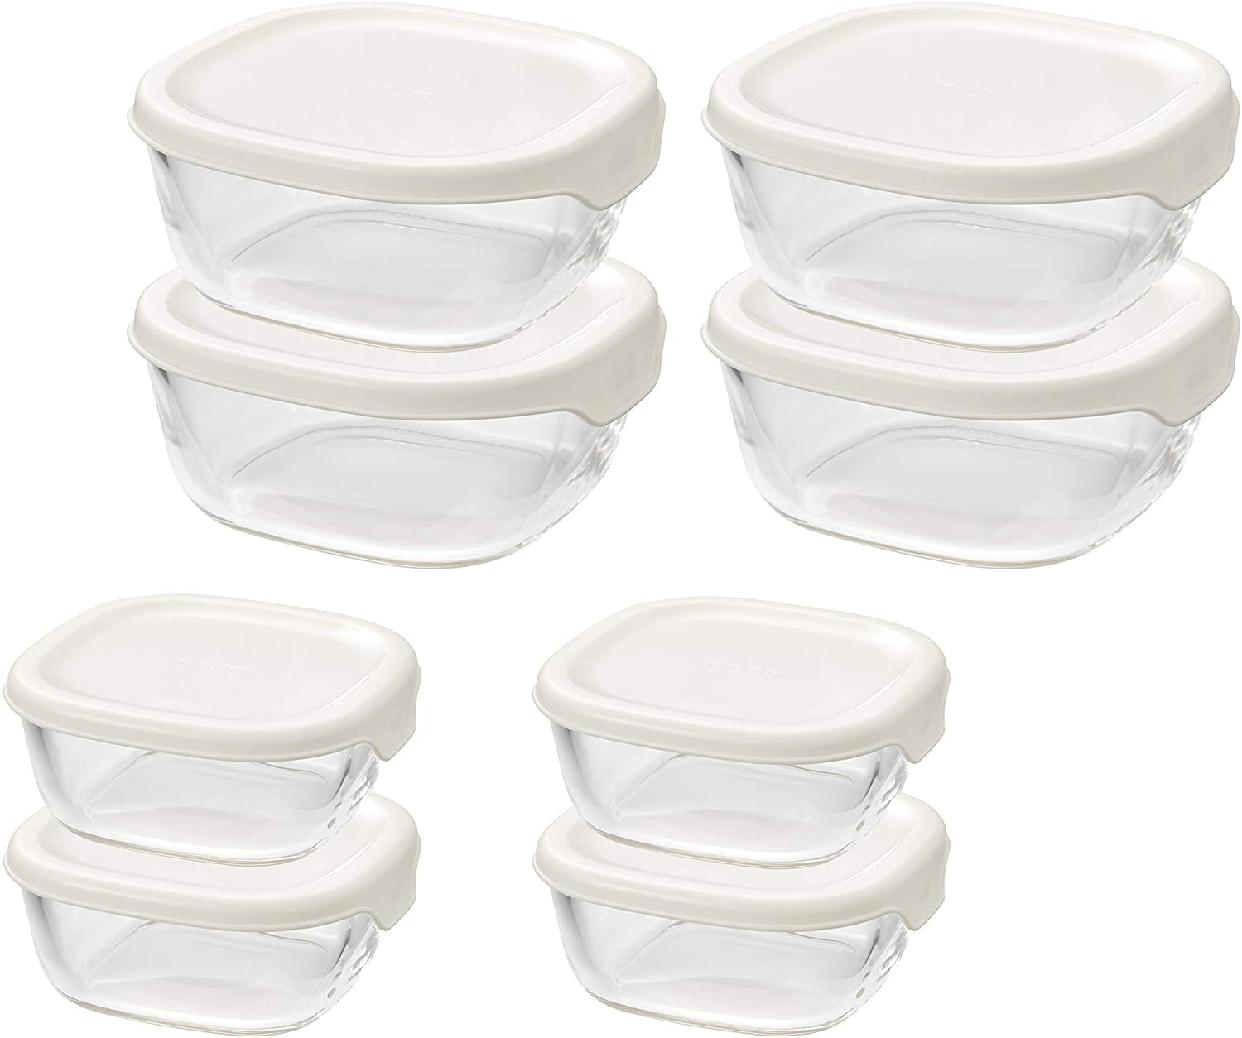 HARIO(ハリオ) 耐熱ガラス製保存容器セット 8個入り KST-5604-OWの商品画像